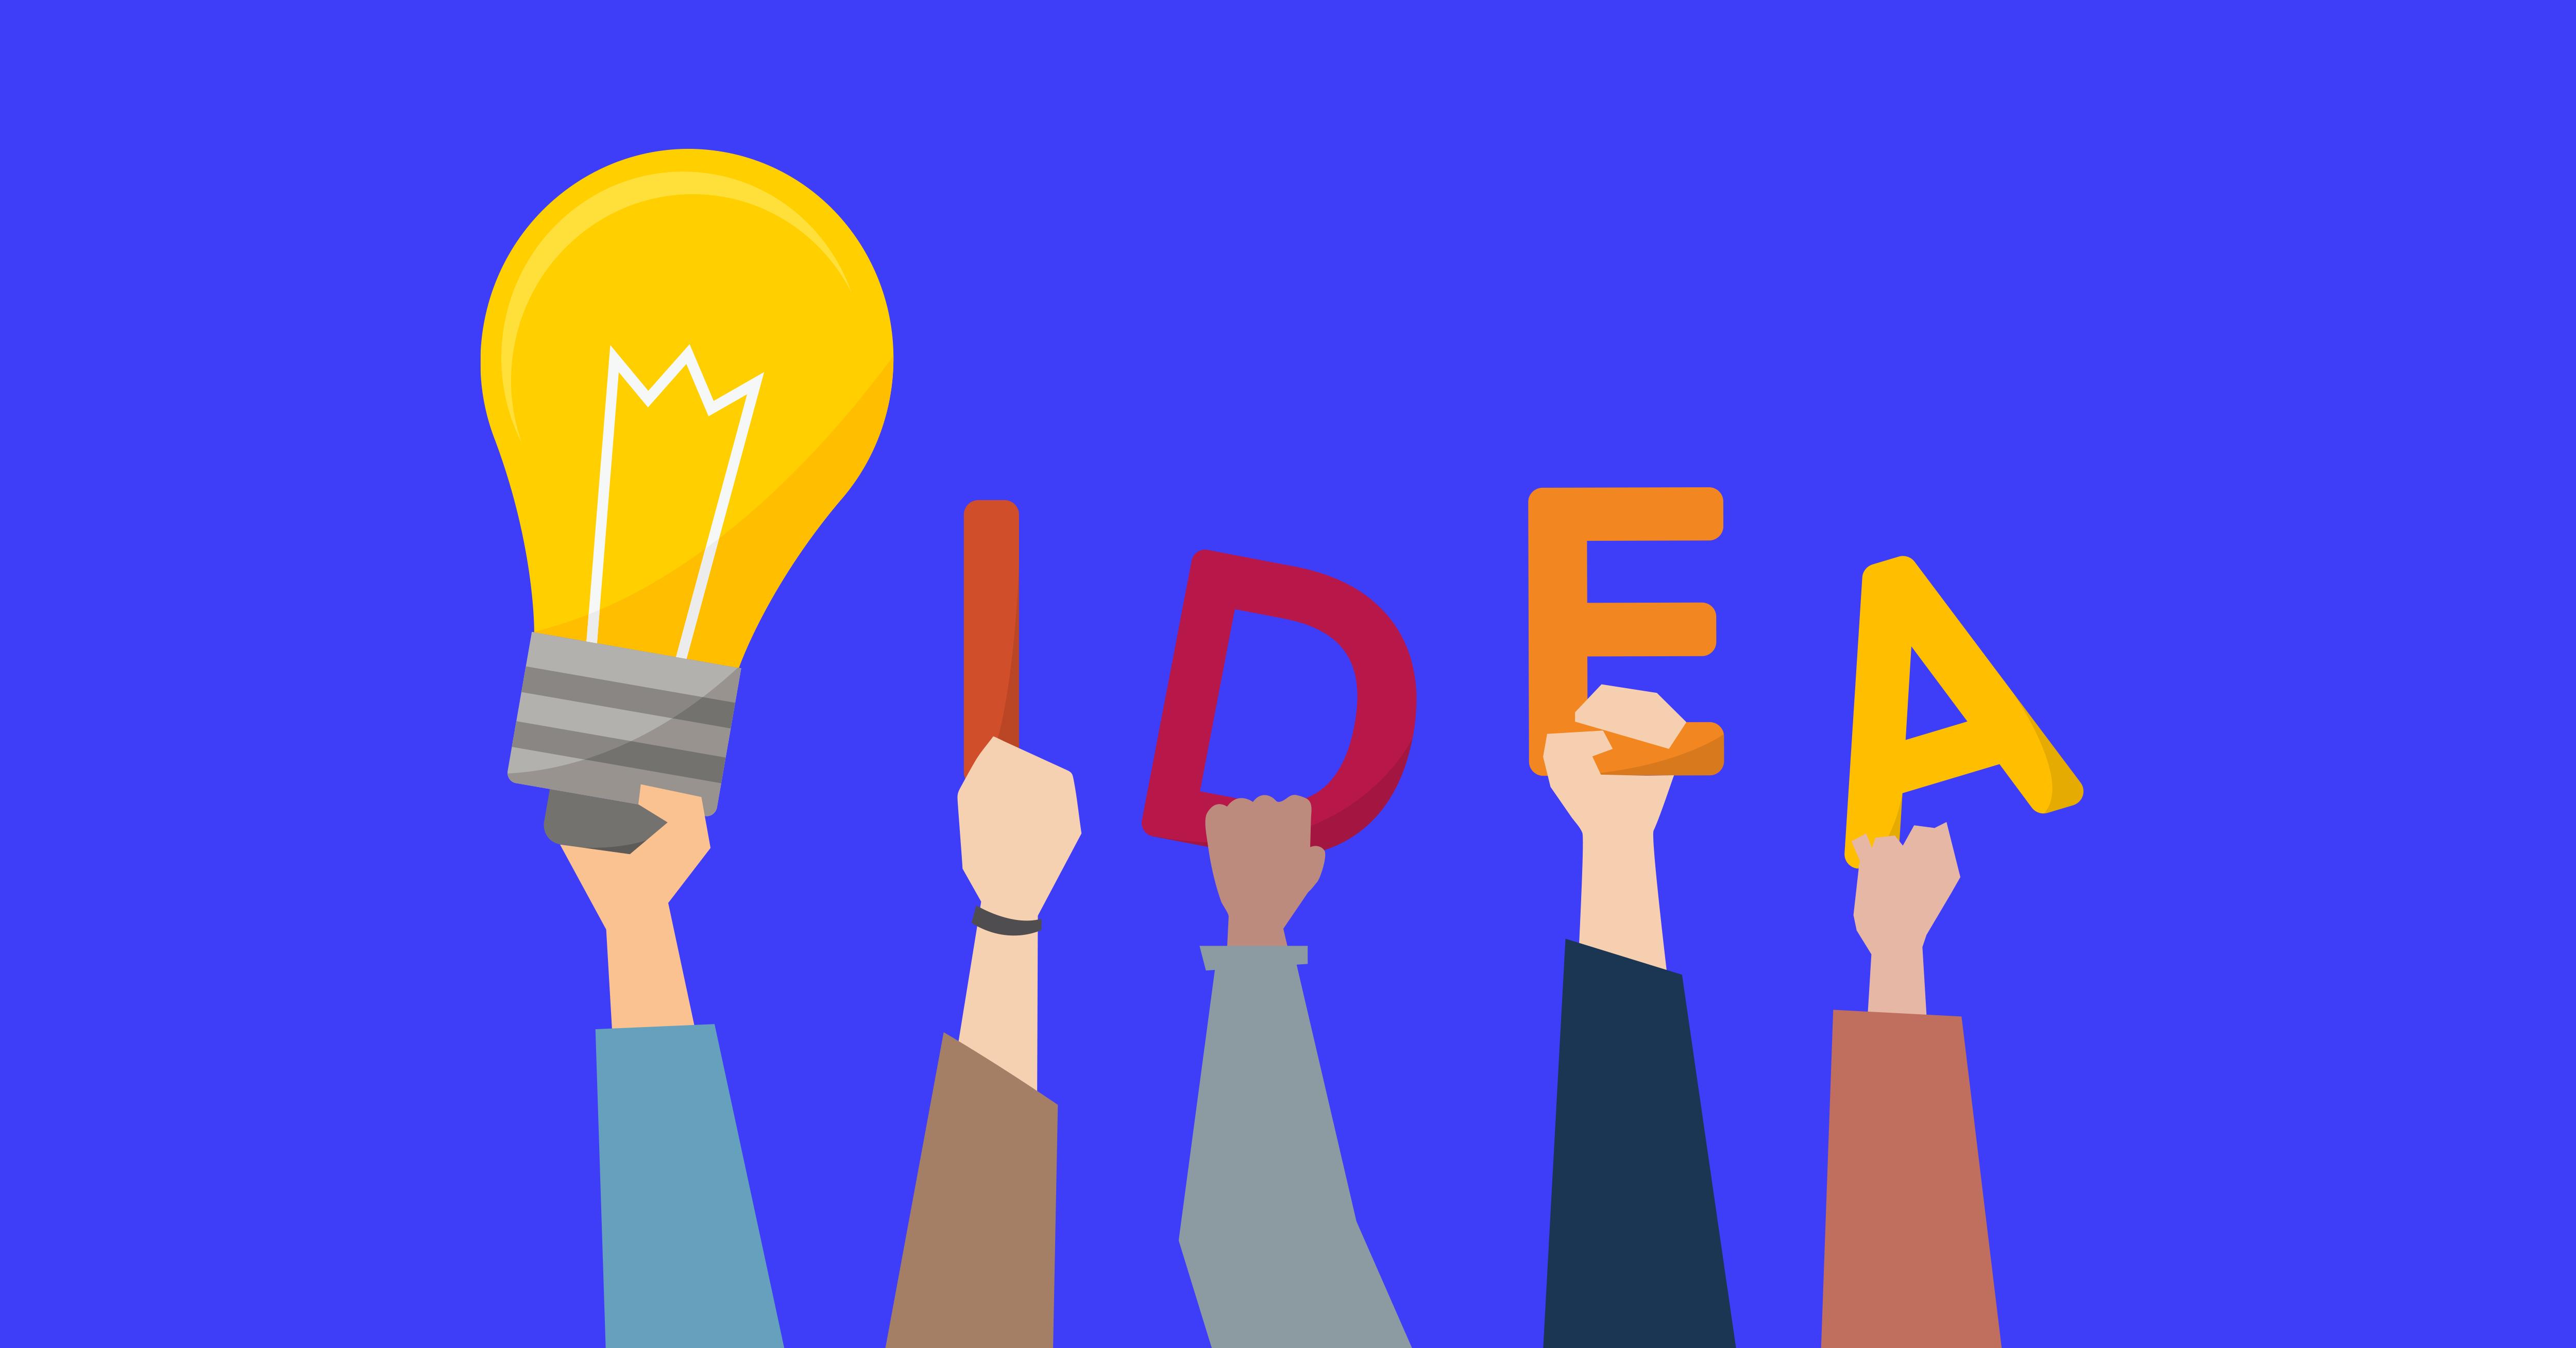 https://spotme.com/wp-content/uploads/2021/01/Hero_27-Creative-Event-Promotion-Ideas-For-Your-Next-Online-Event.png